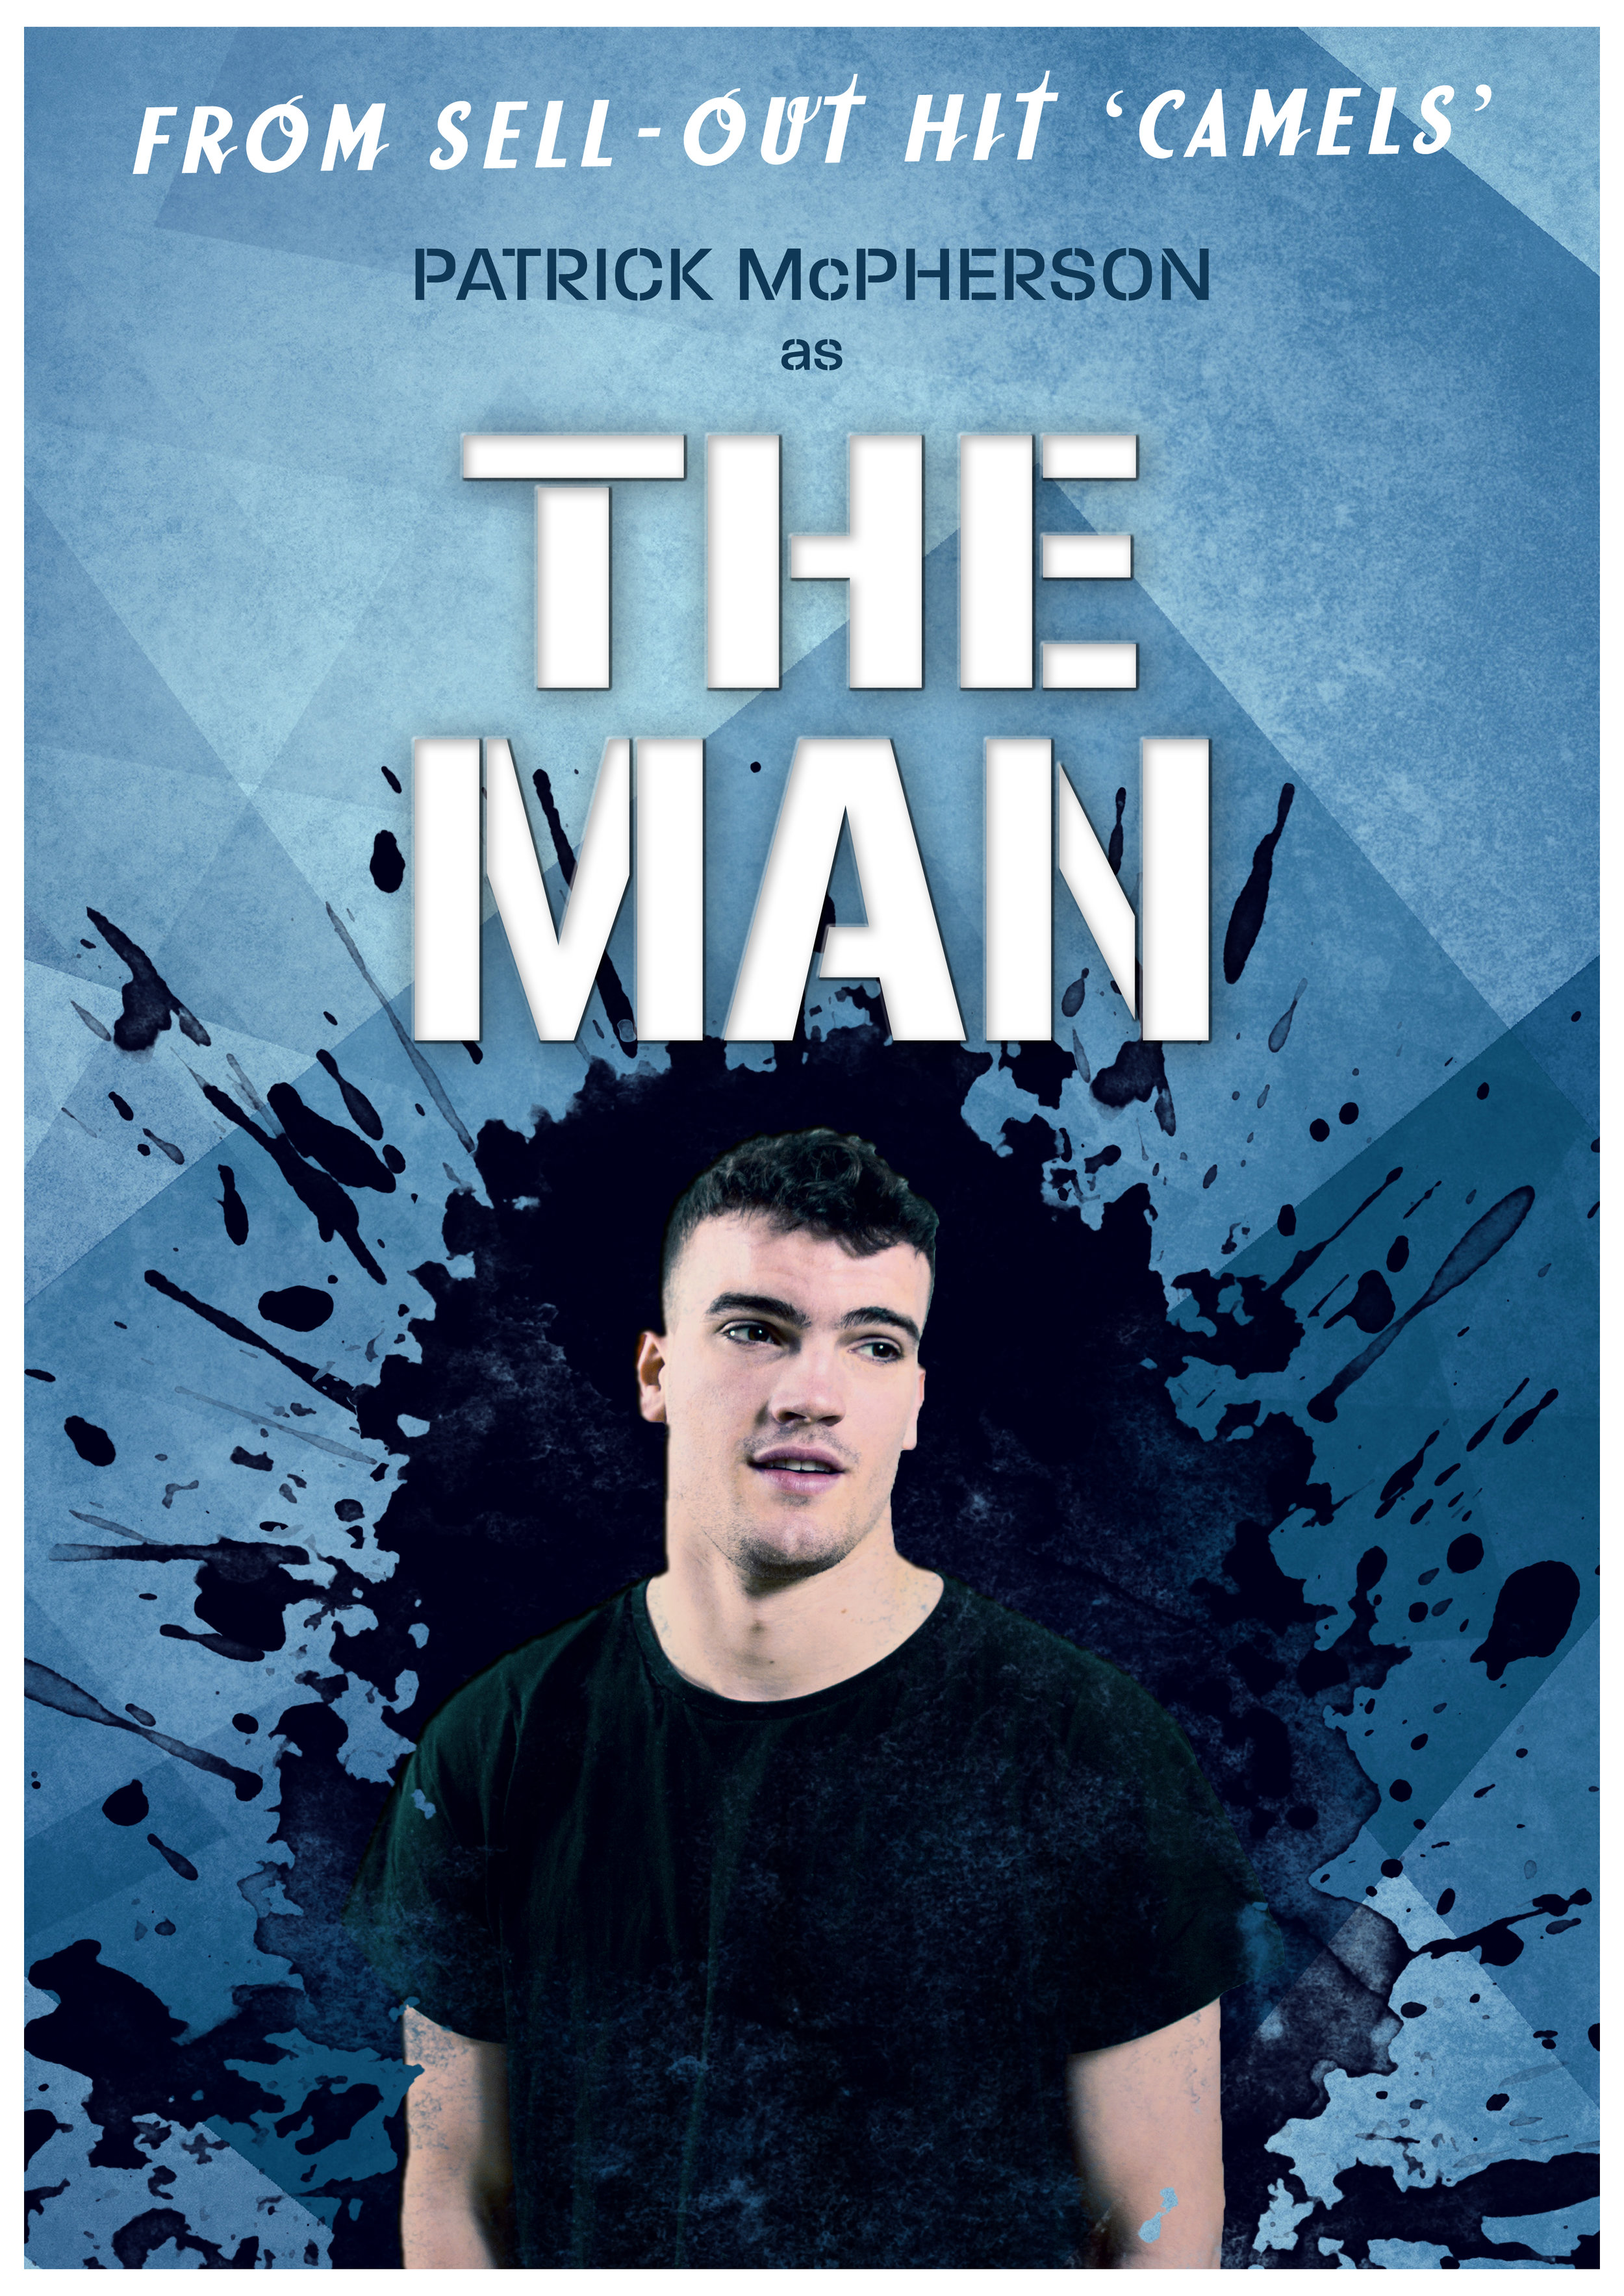 THE-MAN.jpg